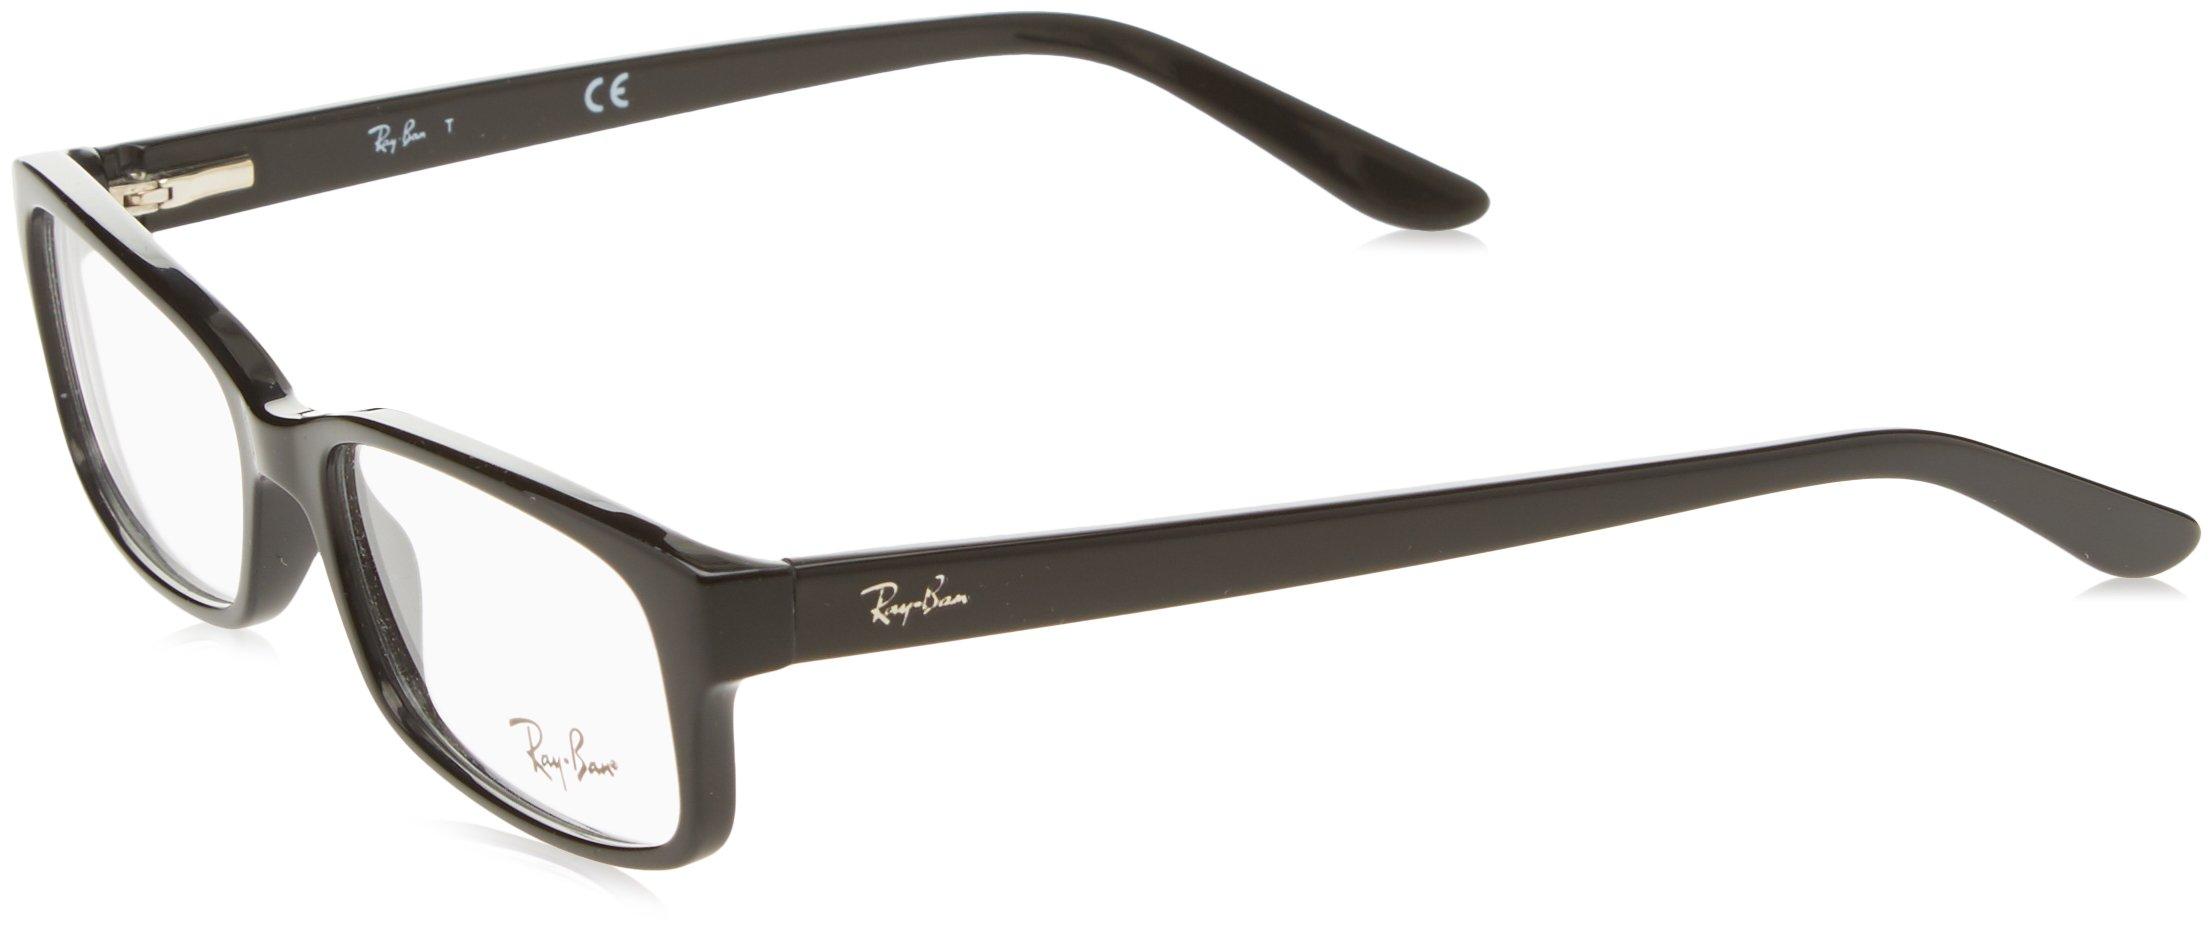 Ray-Ban Rx5187 Rectangular Eyeglasses,Shiny Black,52 mm by Ray-Ban